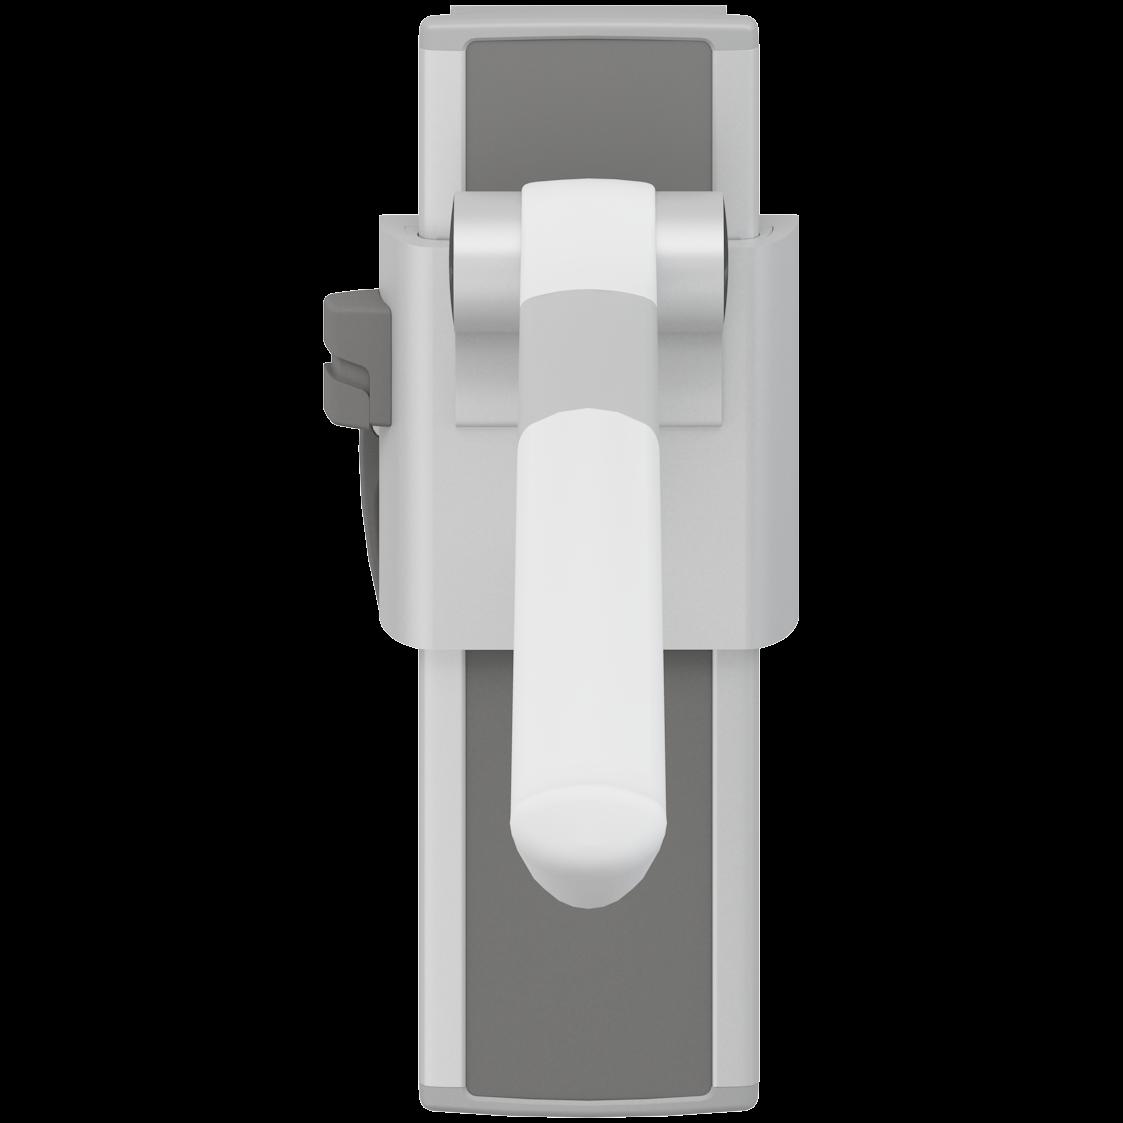 PLUS Stützklappgriff, 700 mm Ausladung, linksbedient